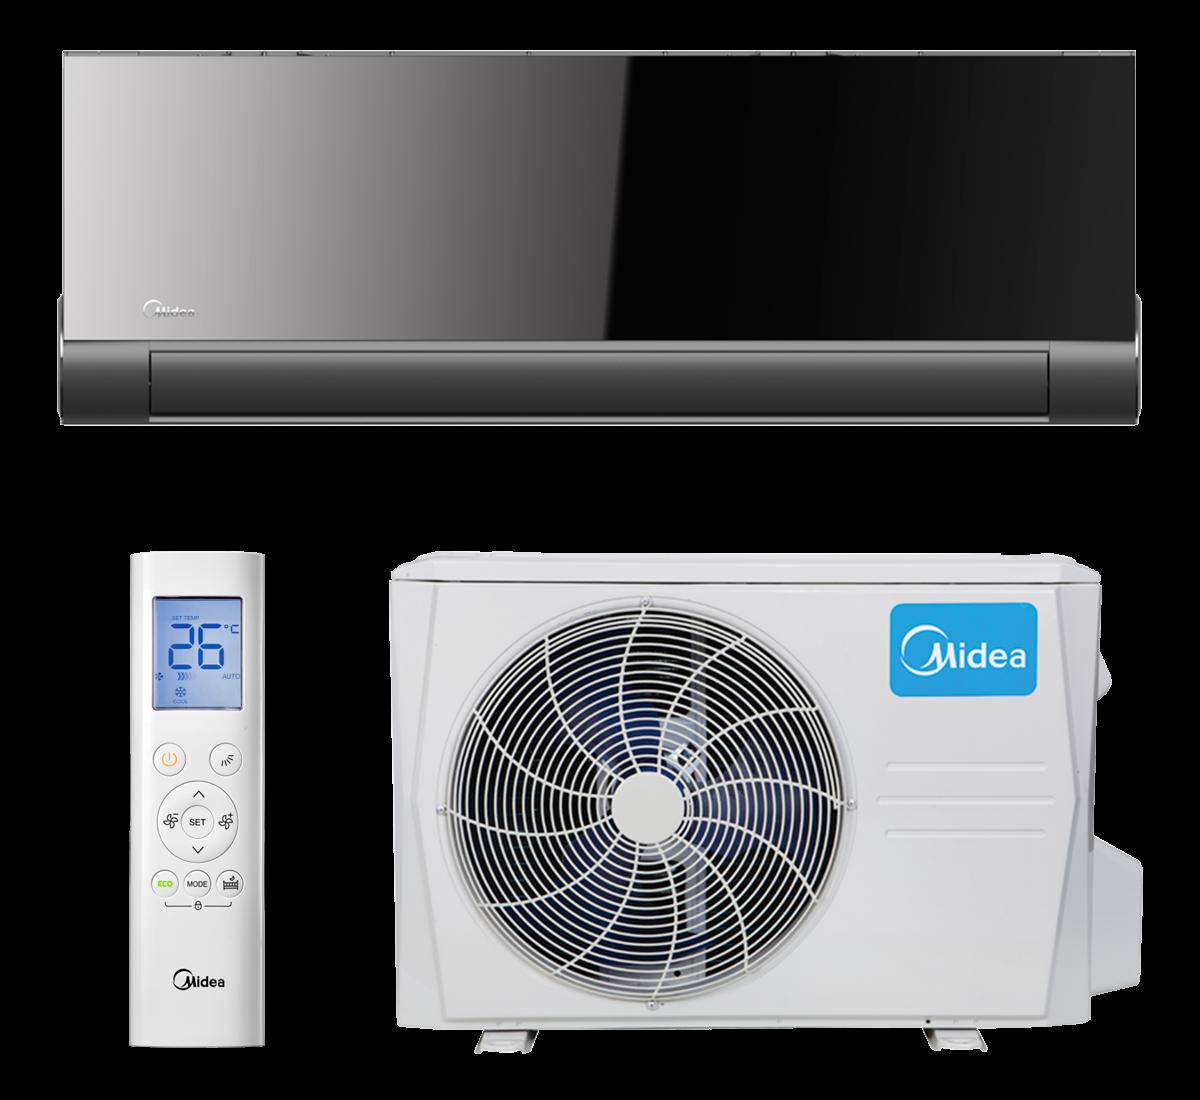 aire acondicionado conjunto split midea inverter modelo vertu plus 26 09 n8 instalacion incluida caseragua 01